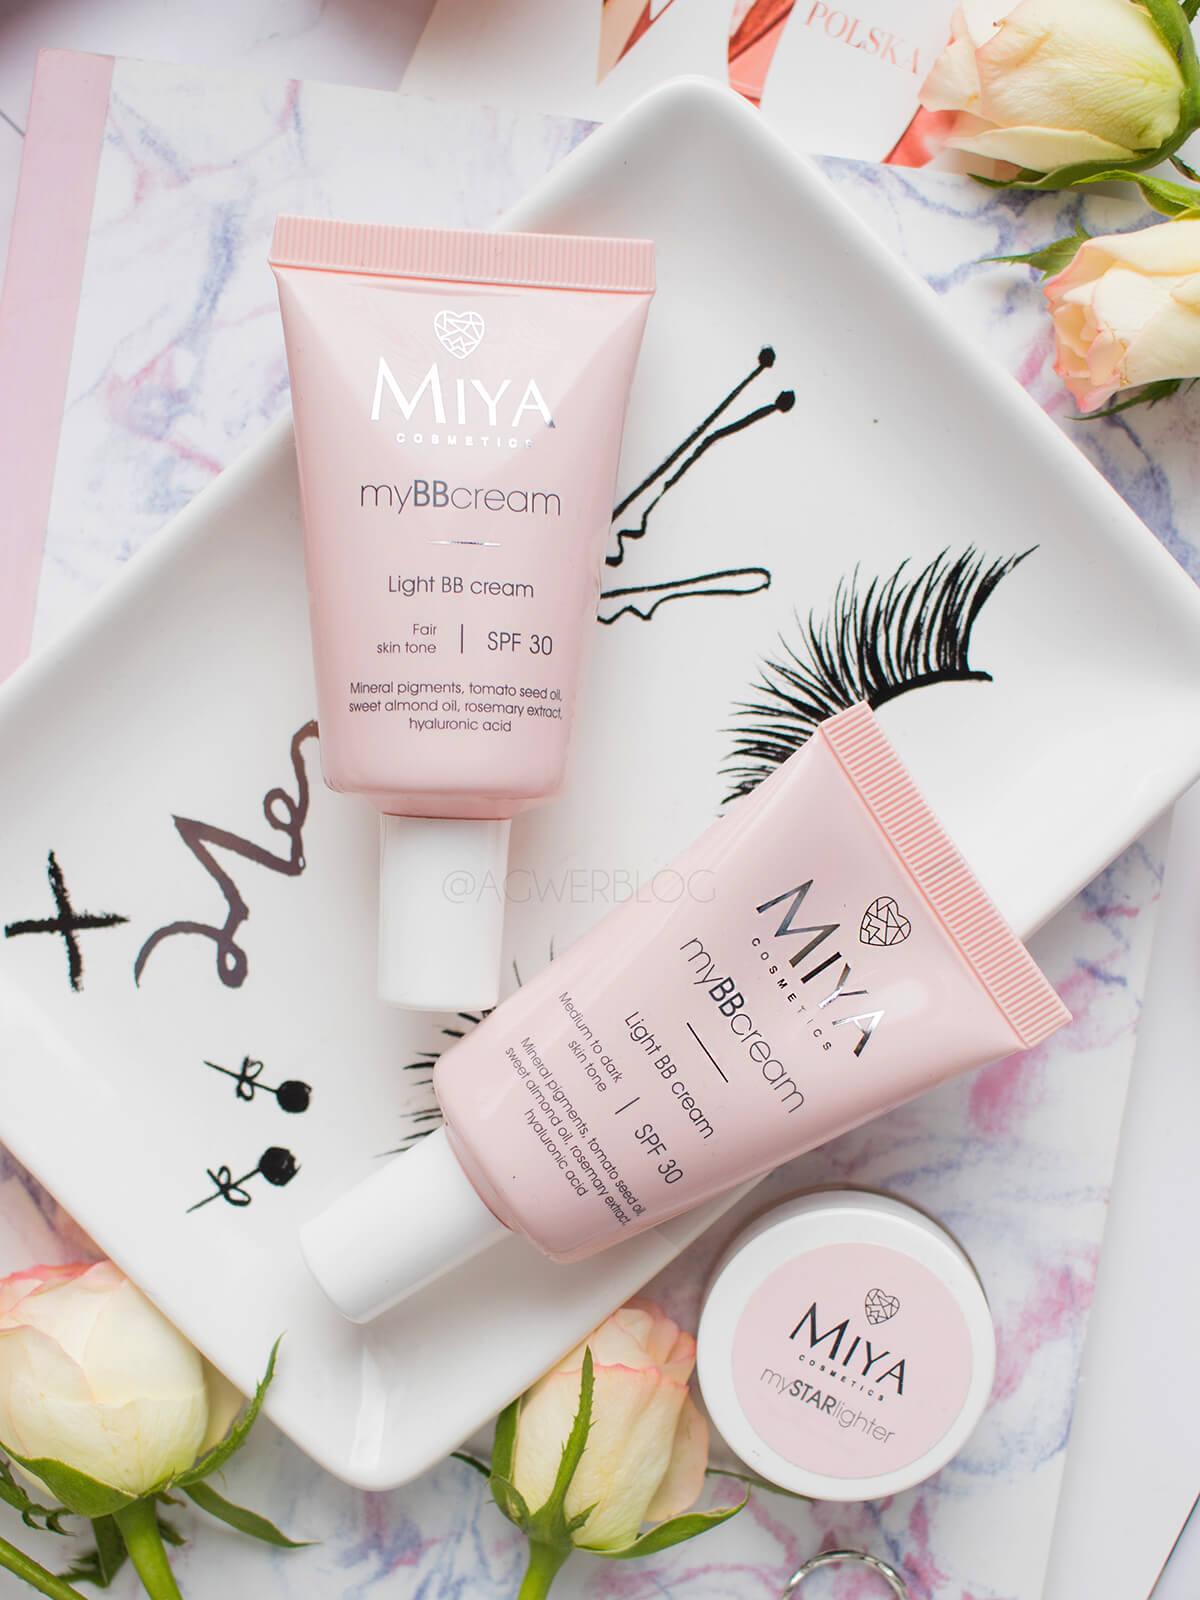 miya cosmetics mybbcream